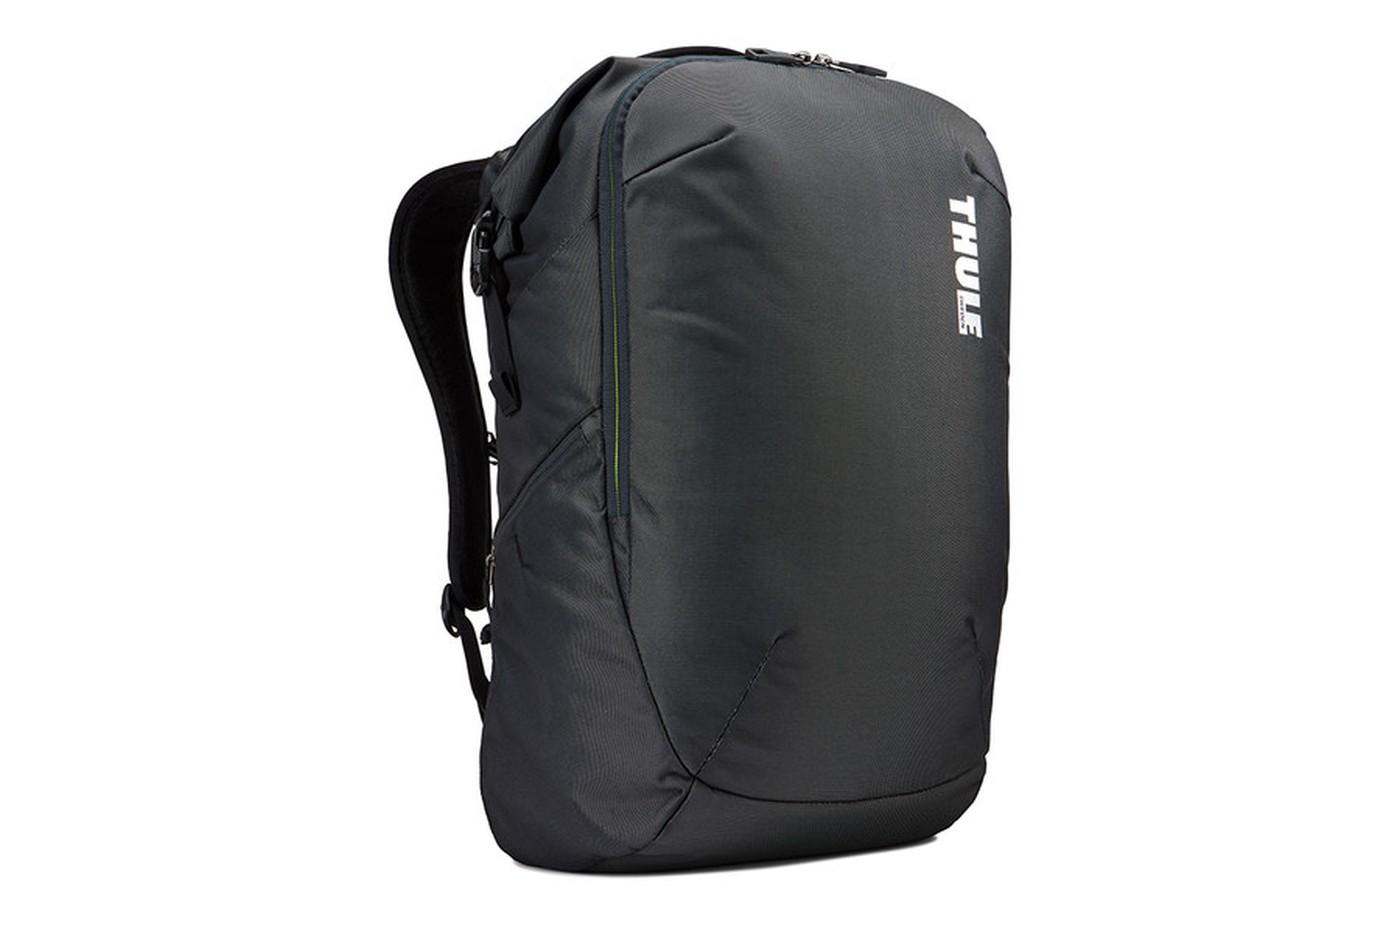 THULE Subterra Backpack 30L - Dark Shadow - Laptop Rucksäcke